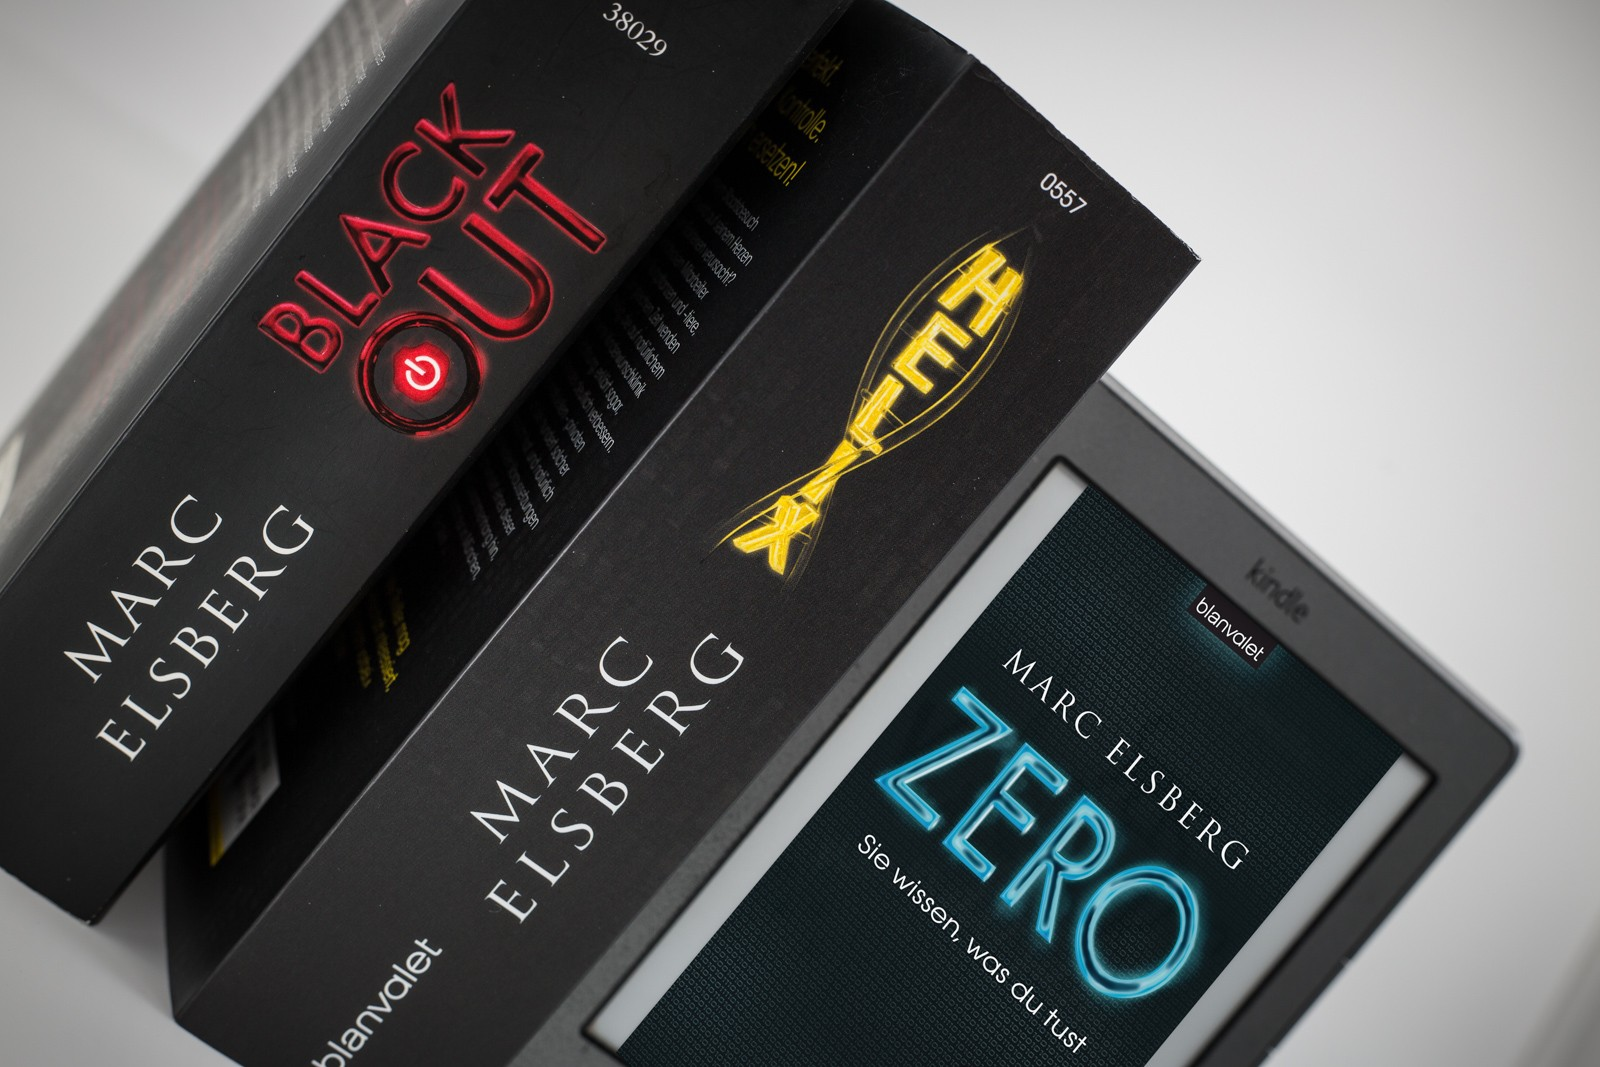 Blackout, Helix & Zero von Marc Elsberg